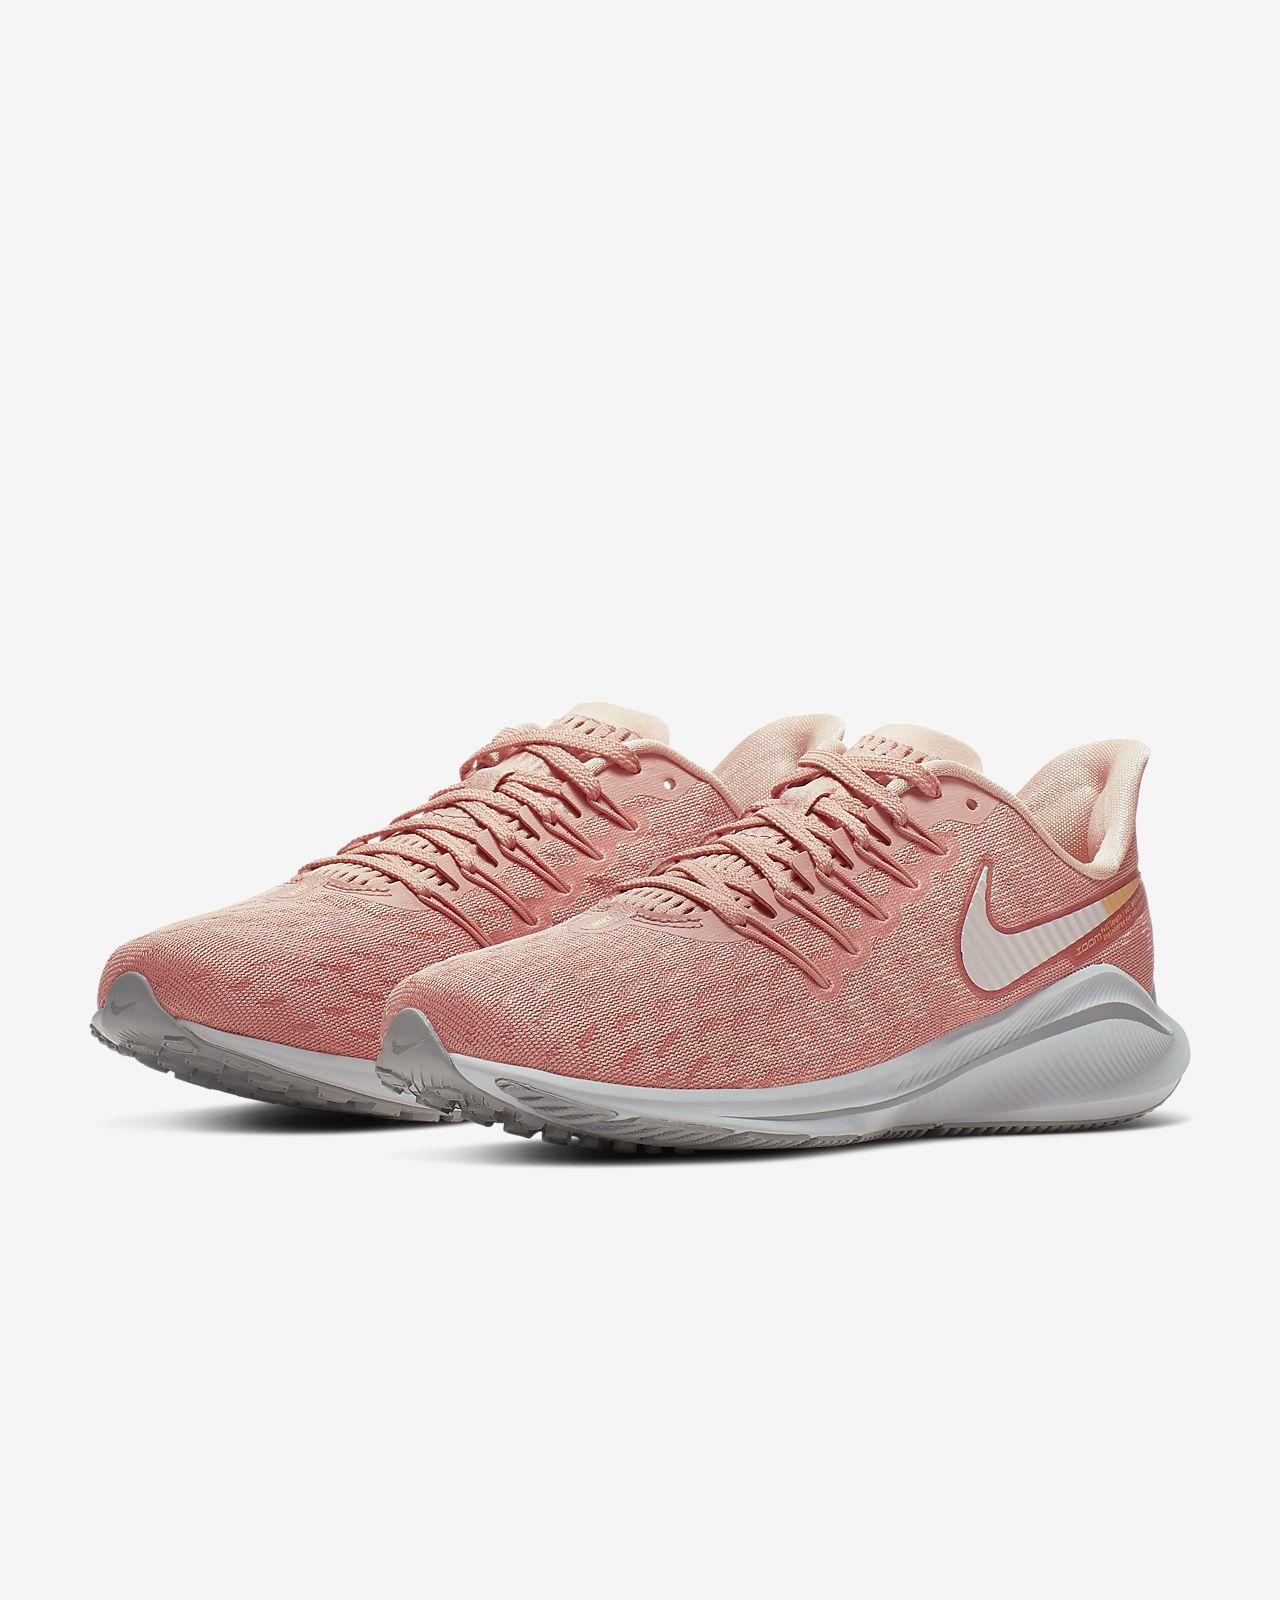 Chaussure Zoom Nike Pour De Air Vomero 14 Femme Running PXZiuk